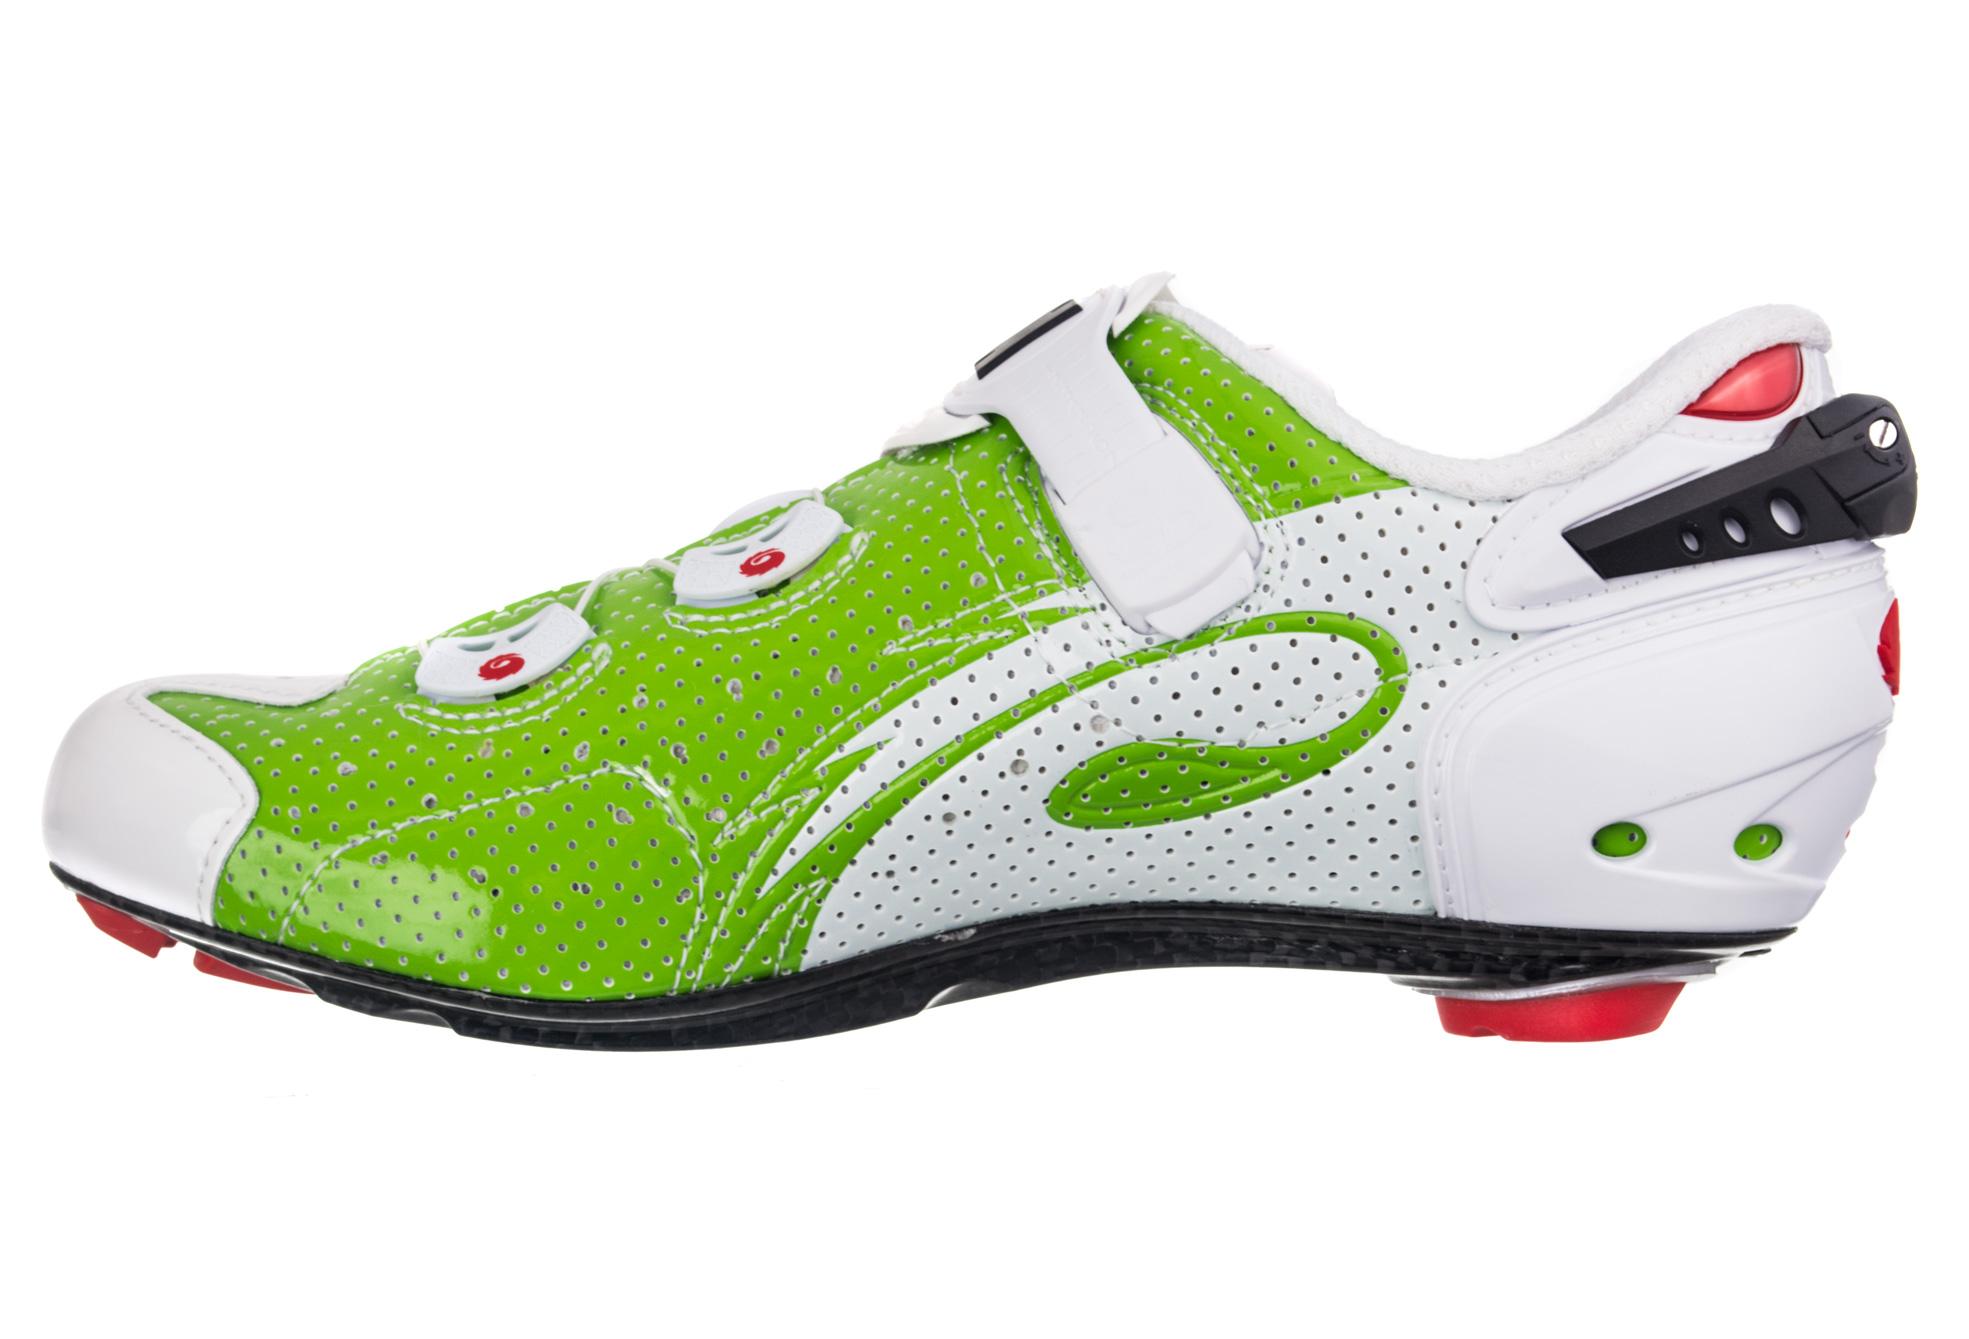 Sidi Wire Carbon Air Vernice Road Shoes White Neon Green | Alltricks.com